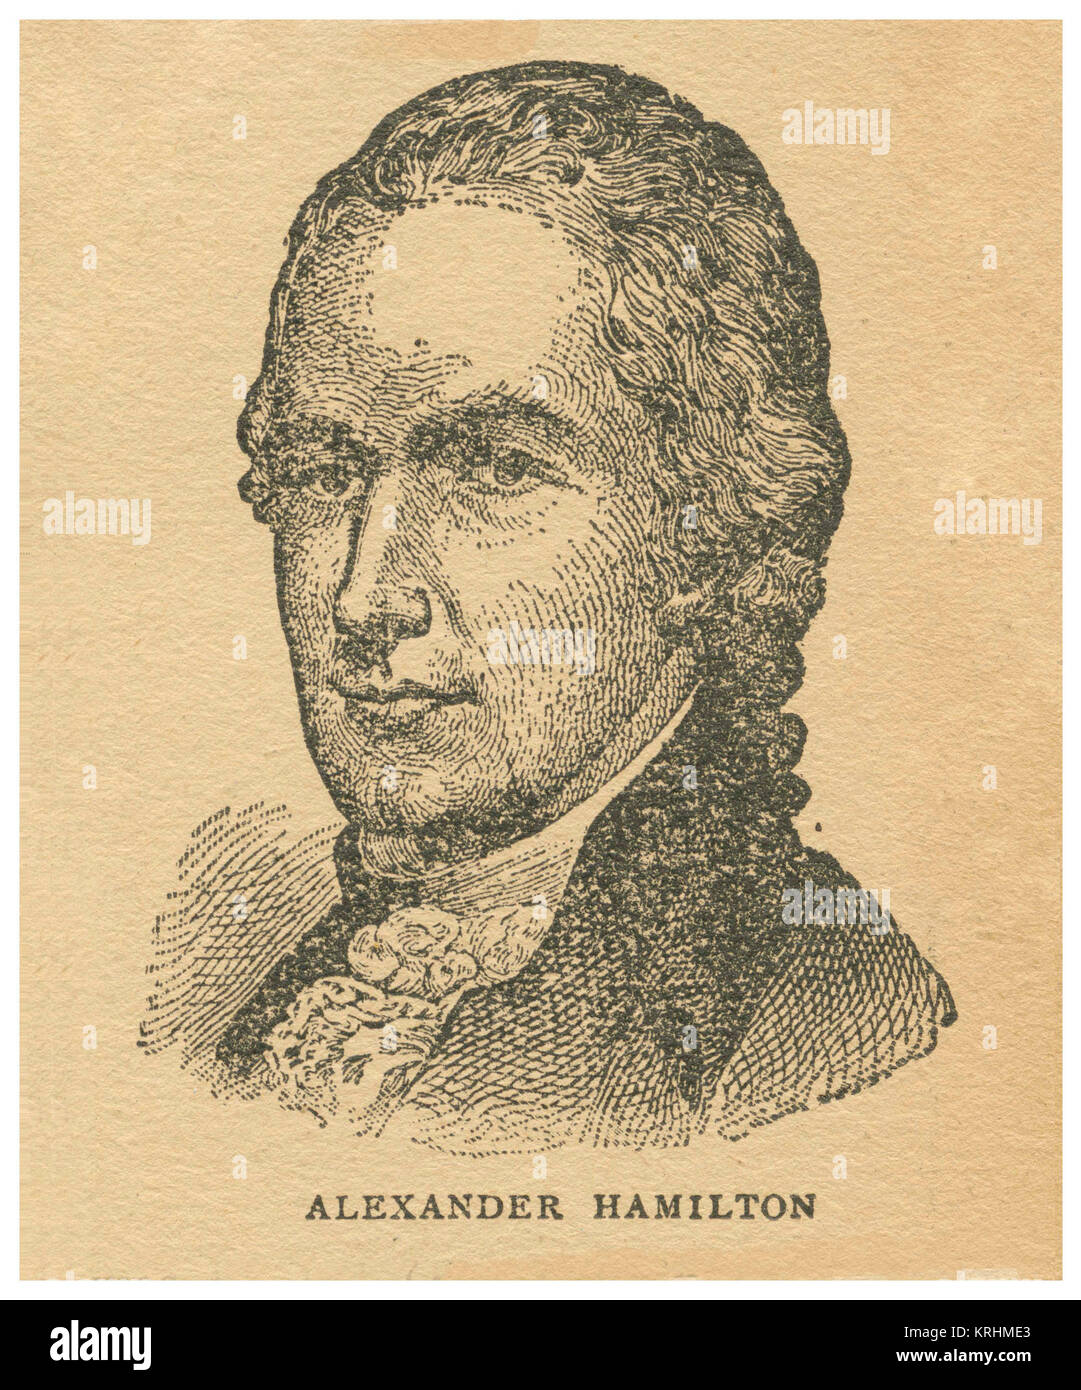 Alexander Hamilton - Stock Image